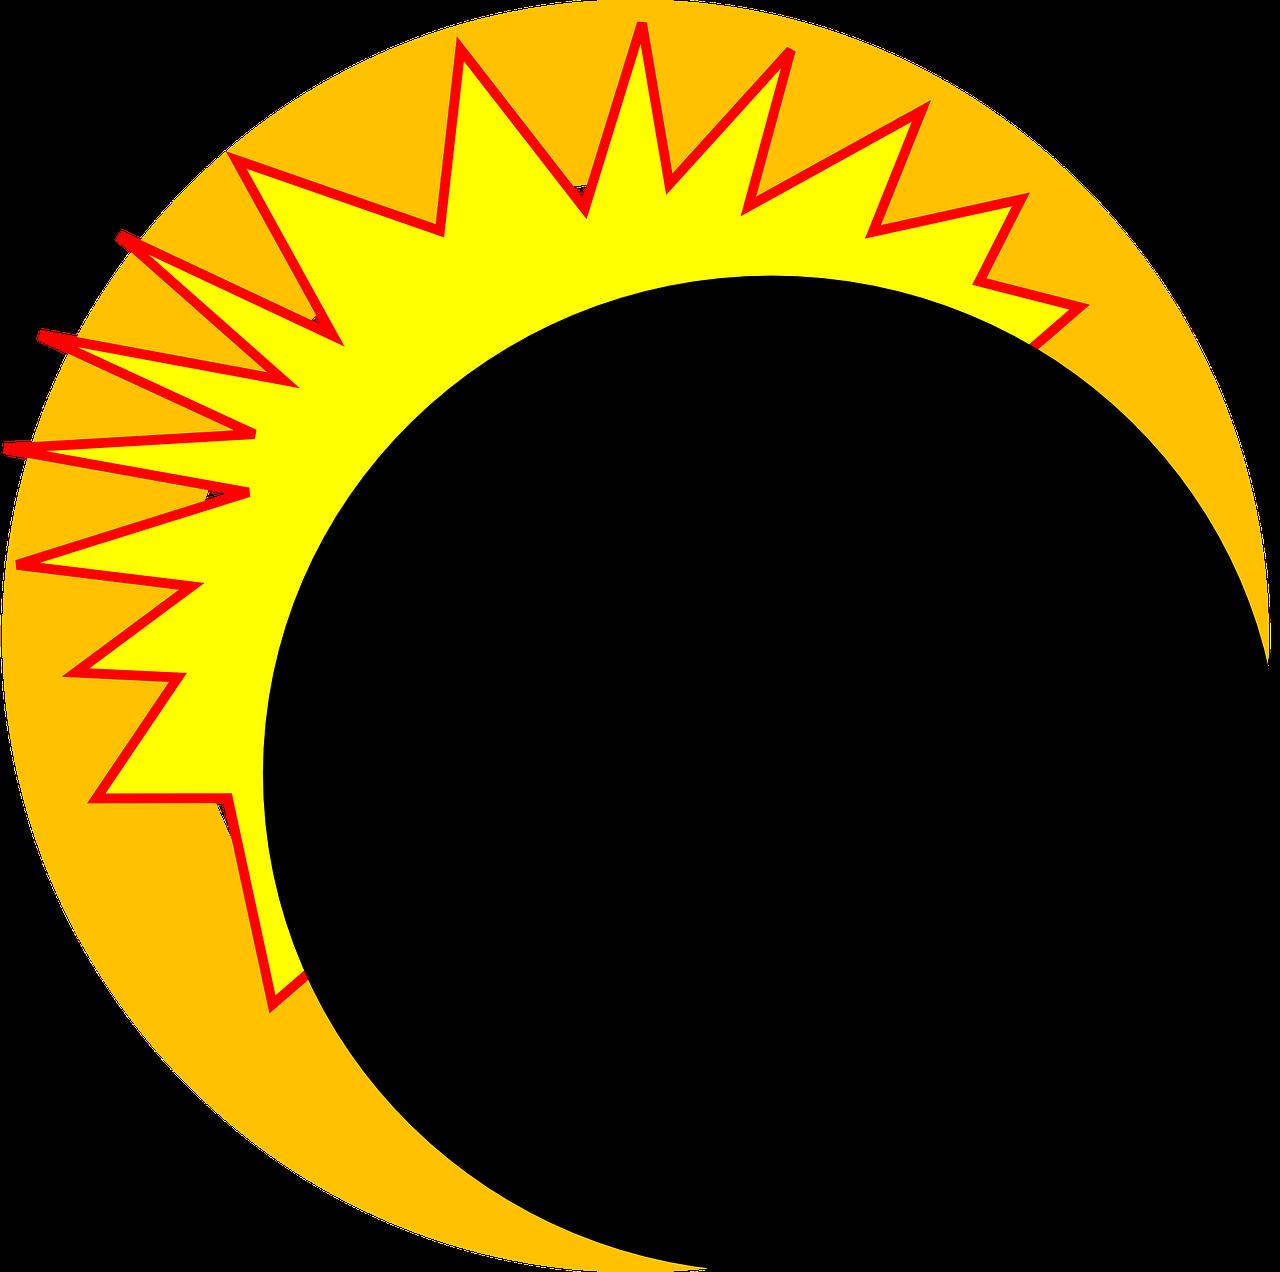 Eclipse,explosion,fire,ray,sun.